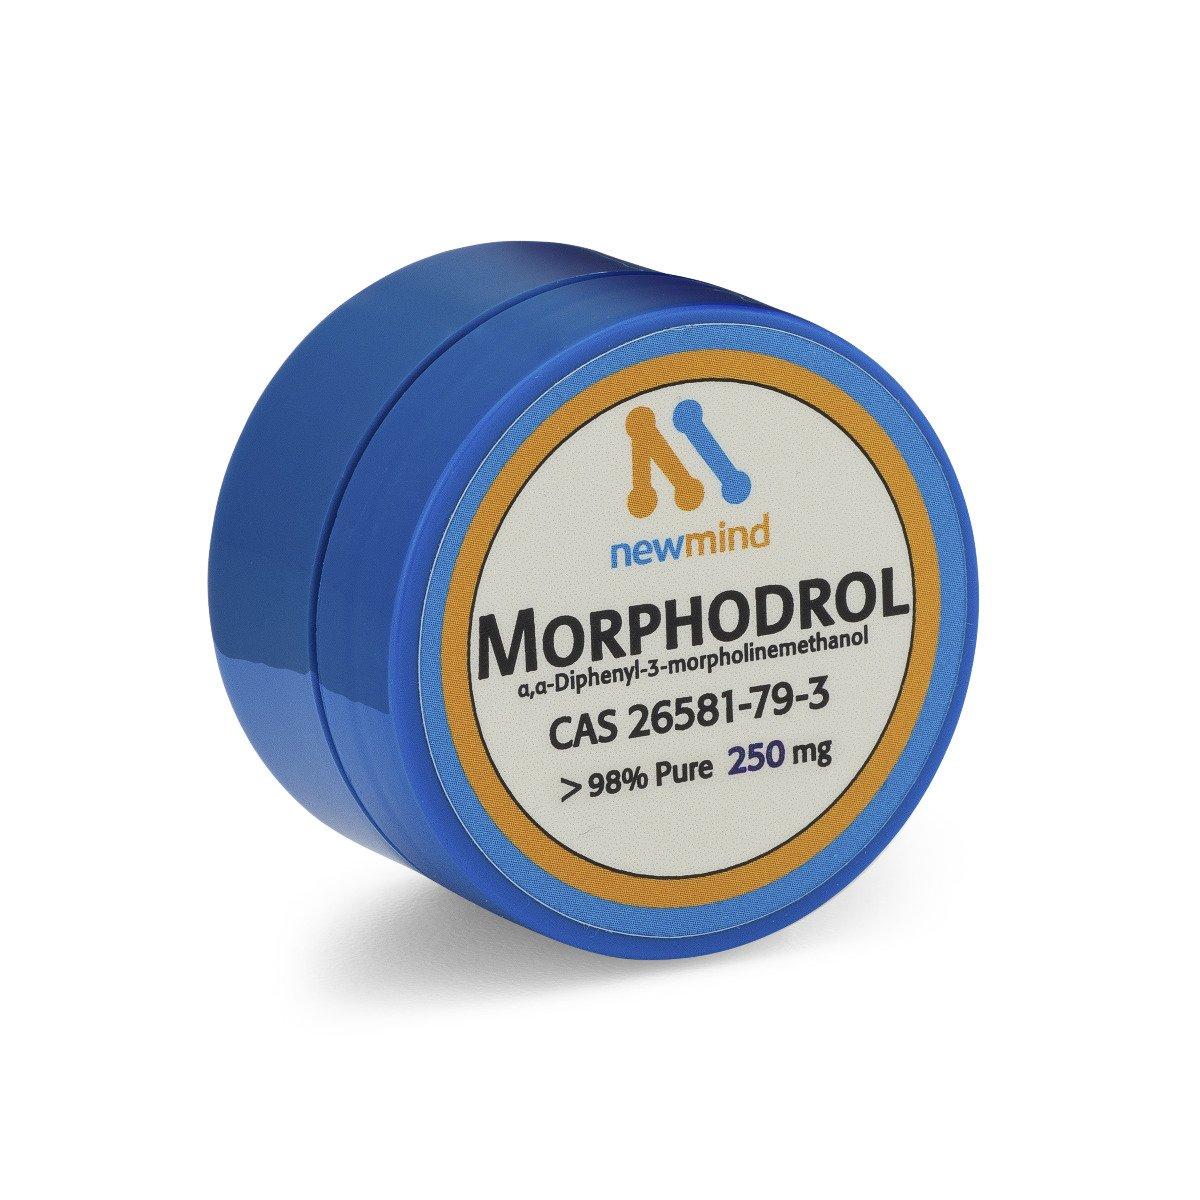 Morphodrol, ≥98%